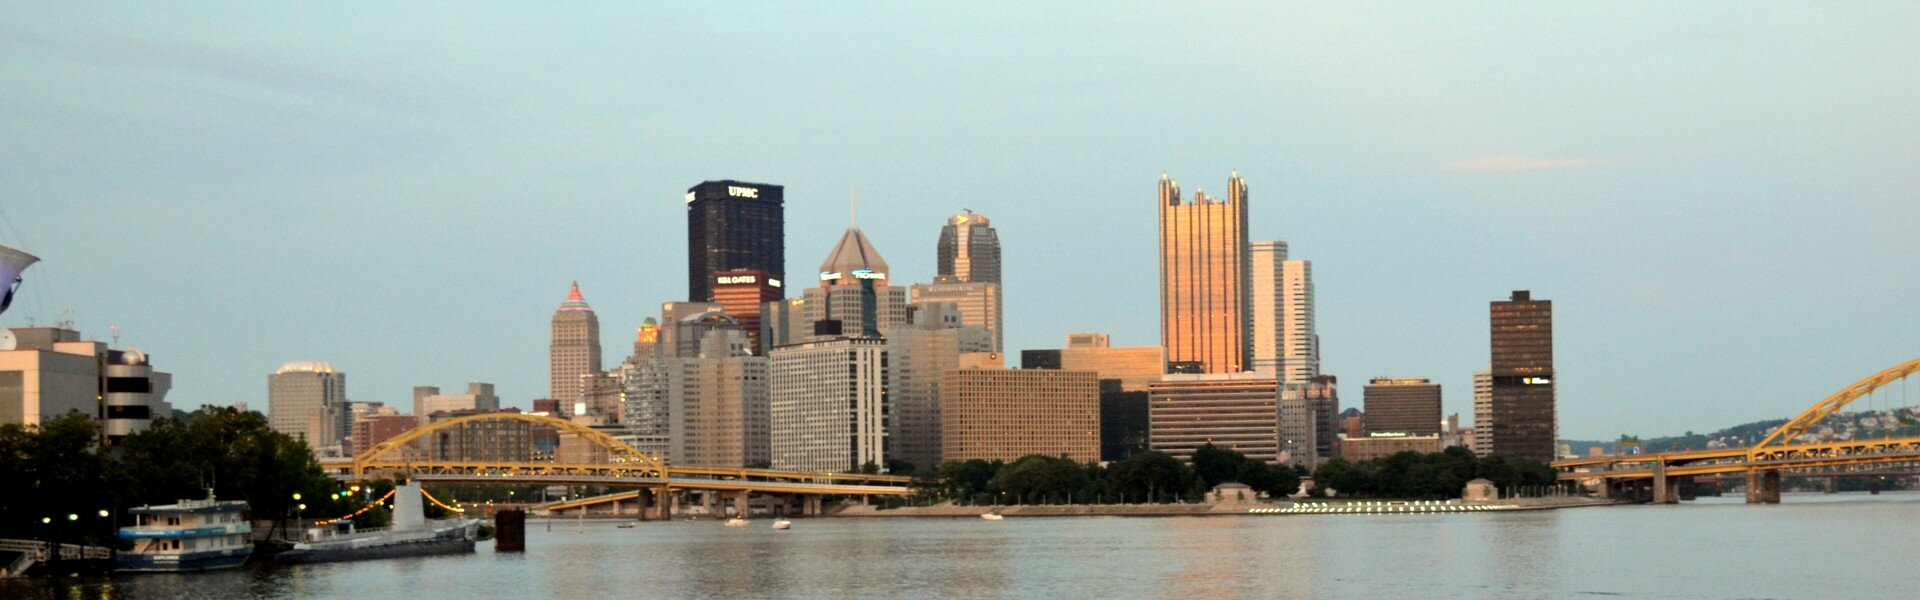 Pittsburgh_DanielDBrown